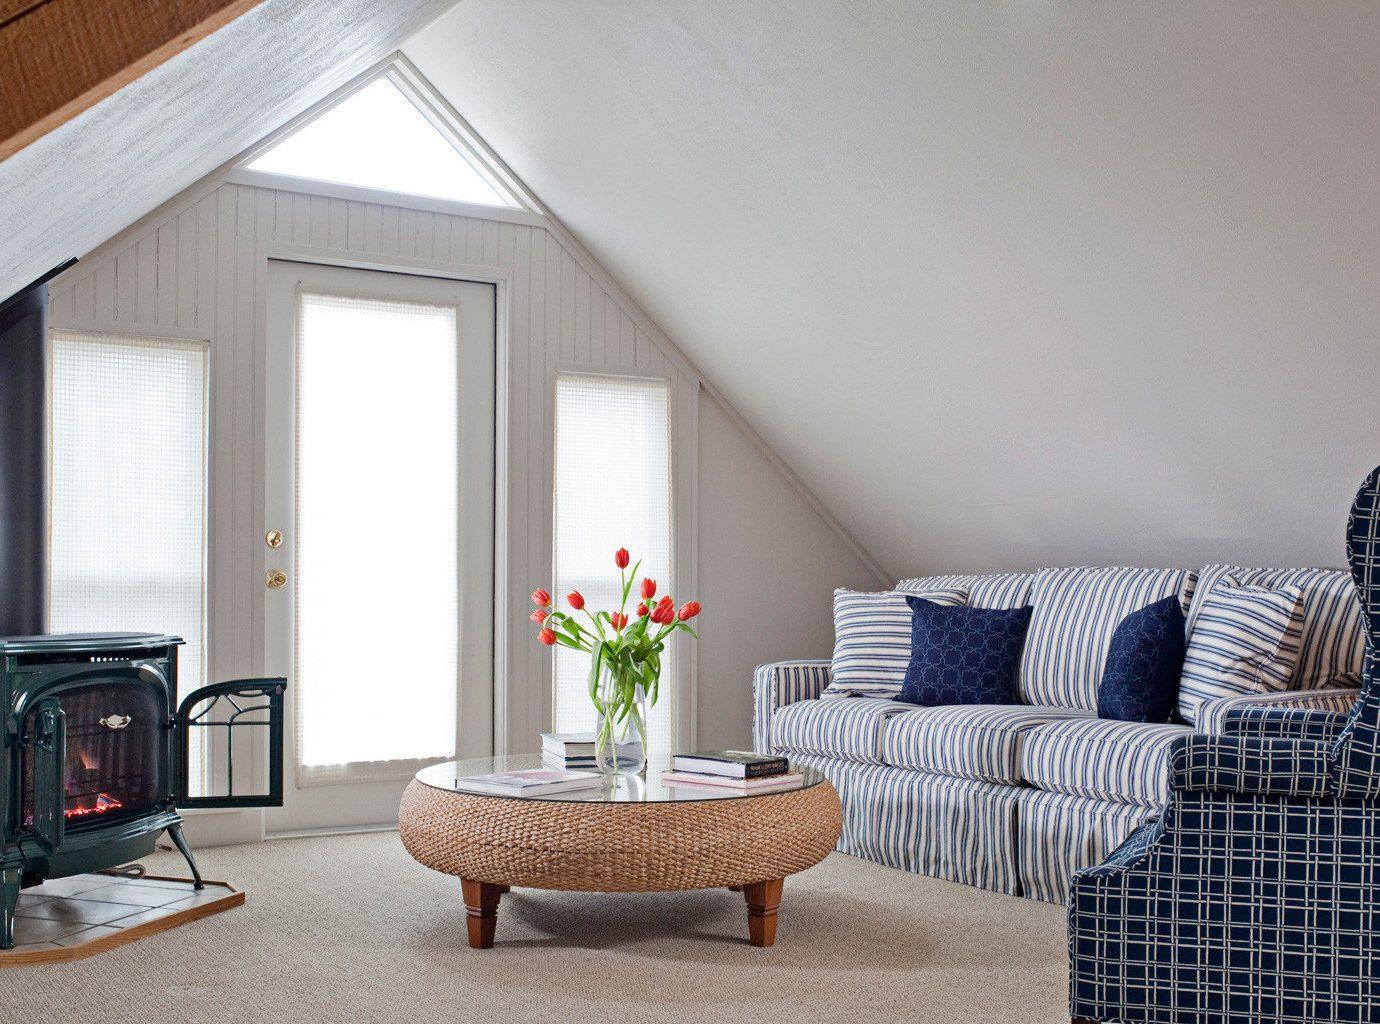 B&B Elegant Fireplace Historic Inn Lounge living room property home cottage porch sofa leather